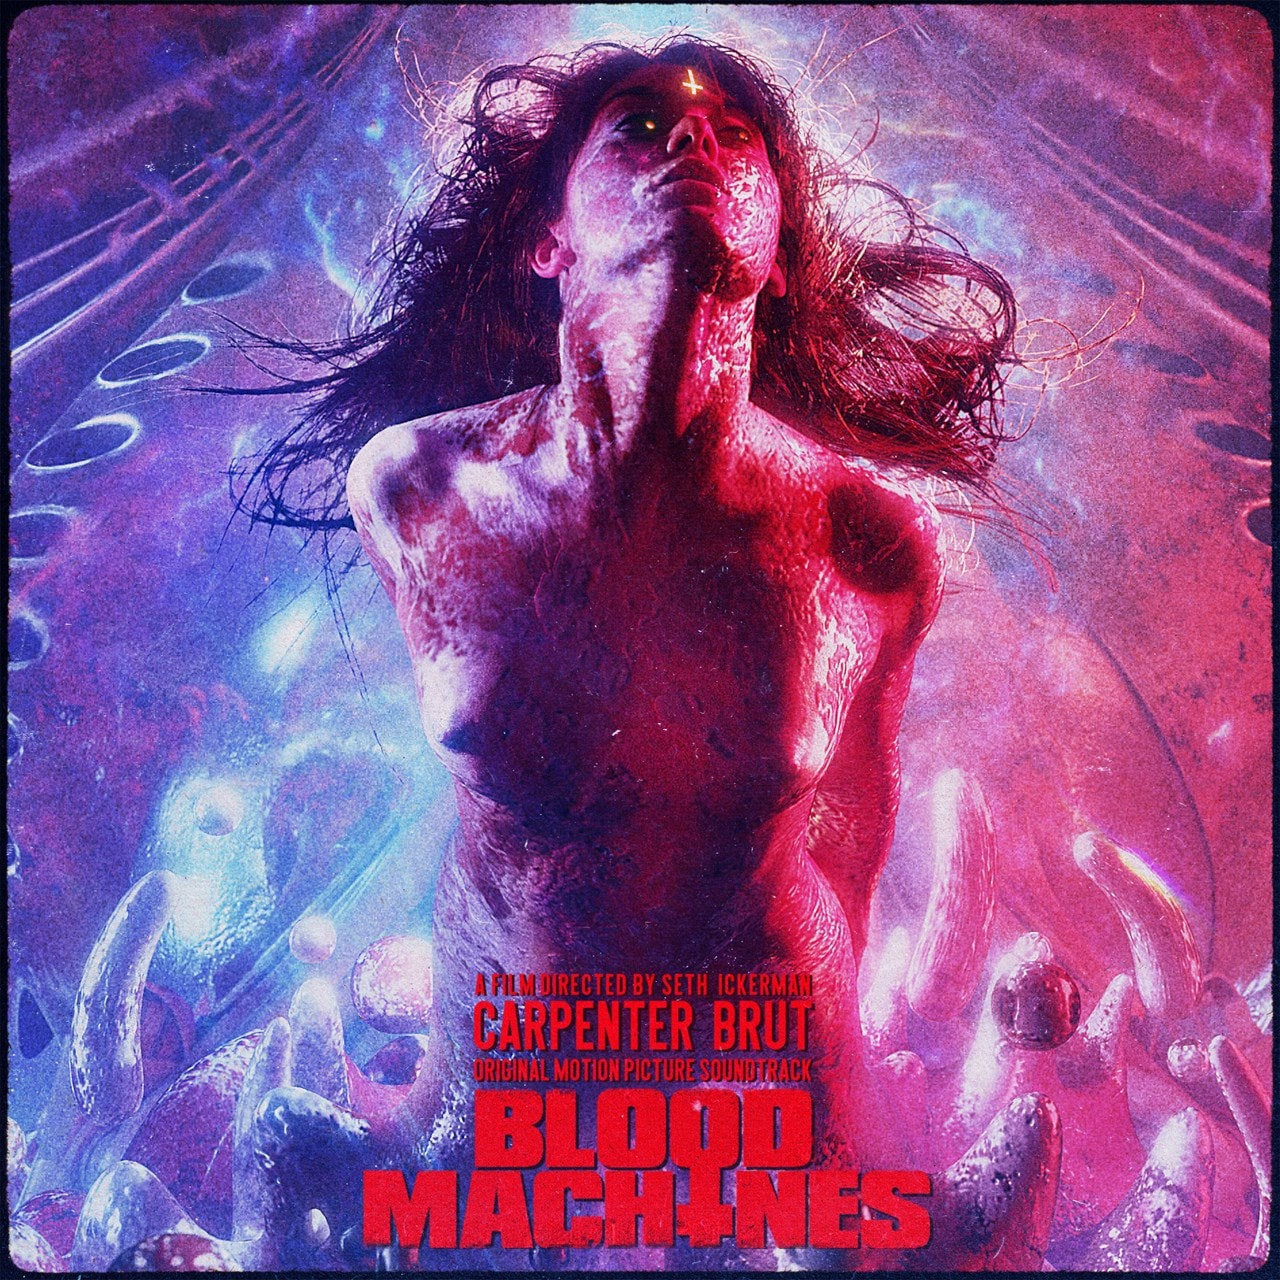 CARPENTER BRUT - BLOOD MACHINES OST